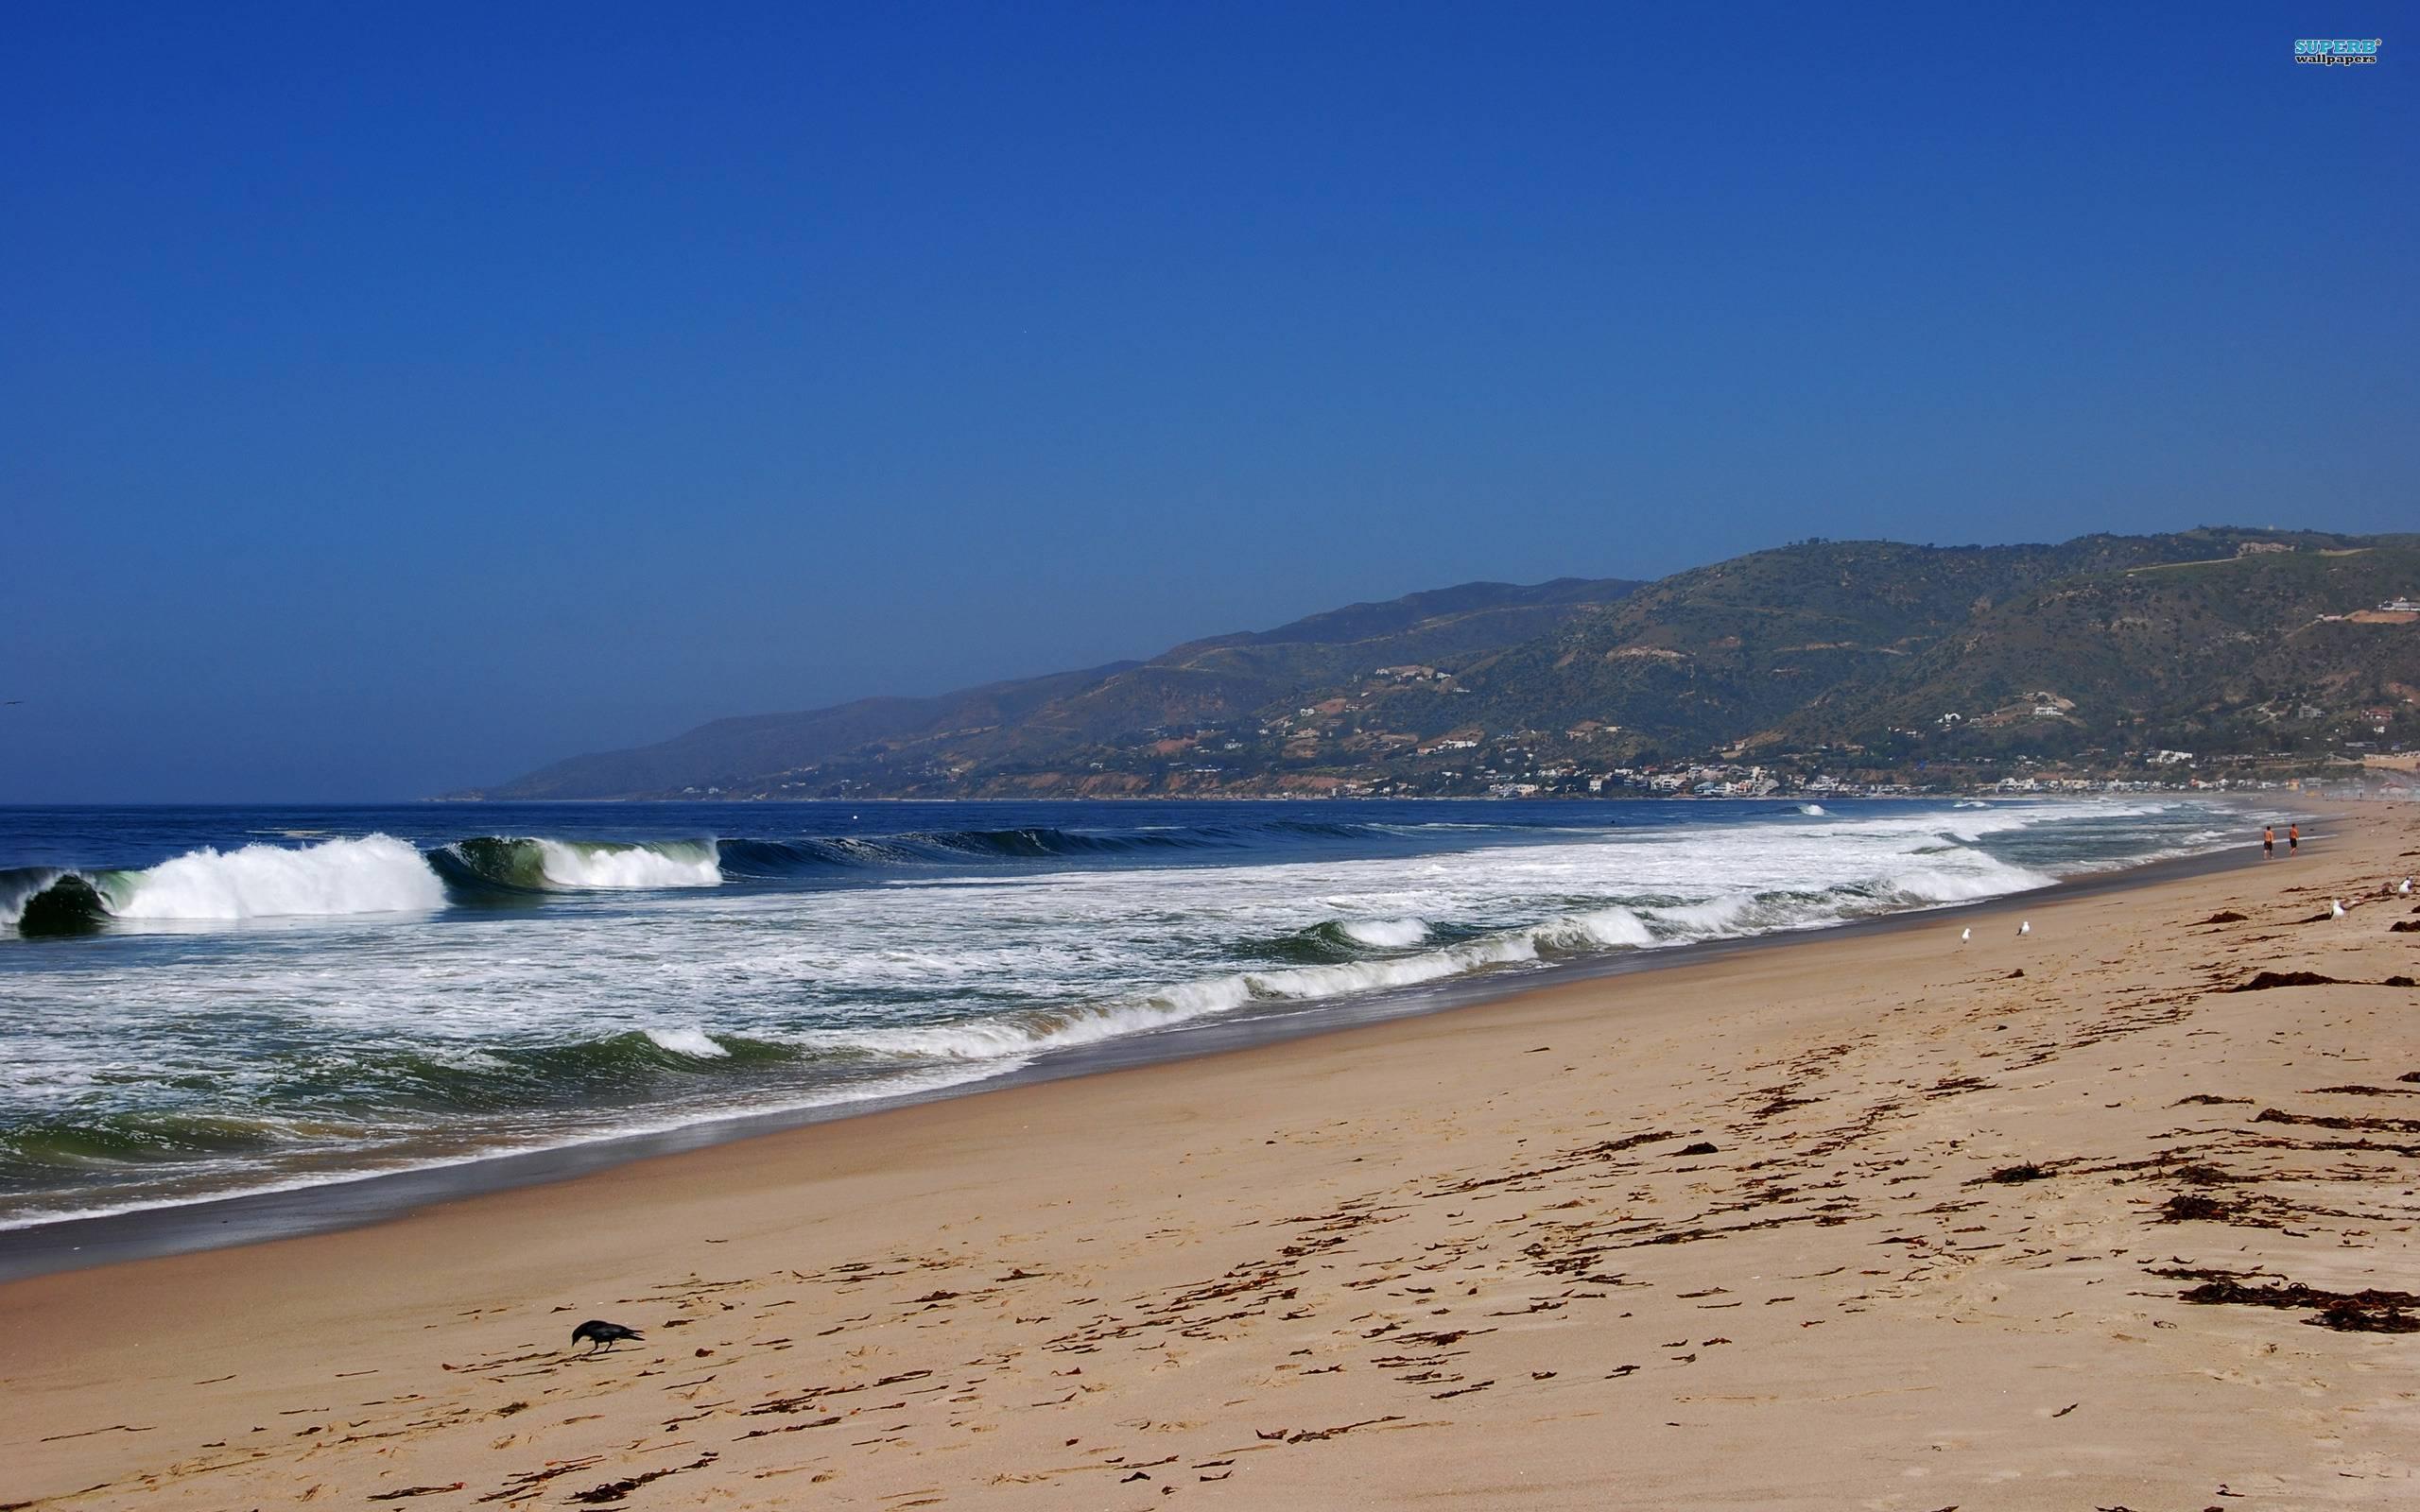 california west coast wallpaper - photo #30